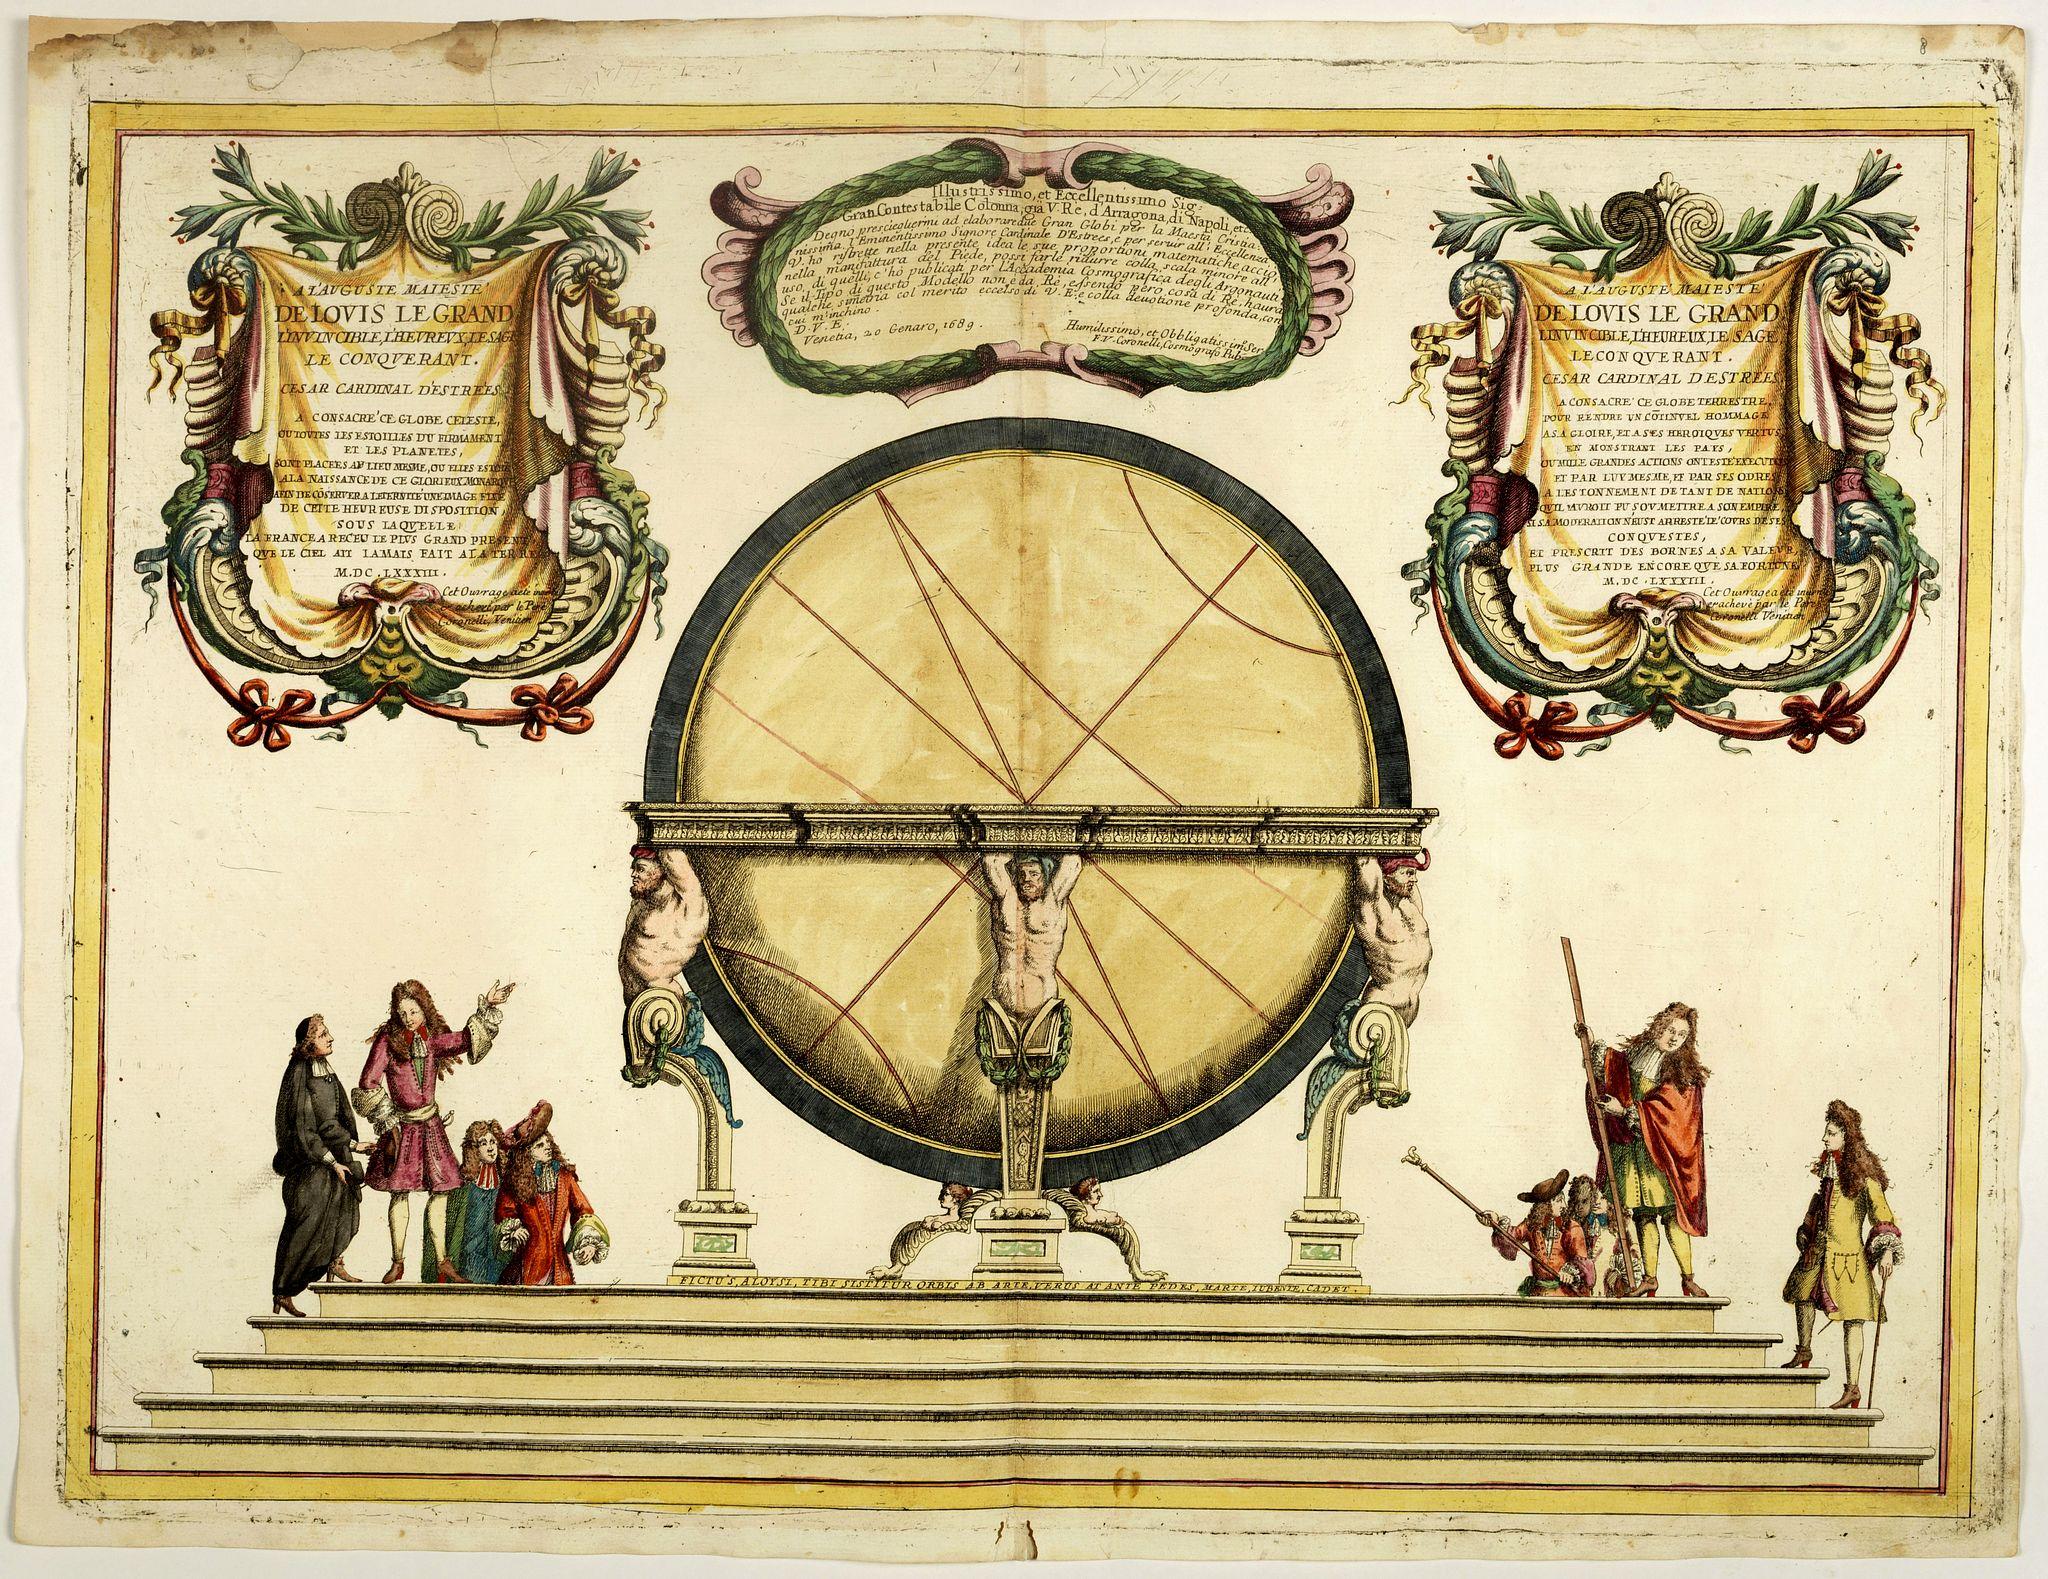 CORONELLI,V.M. -  Illustrissimo, et Eccellentissimo.. Gran Globi ..